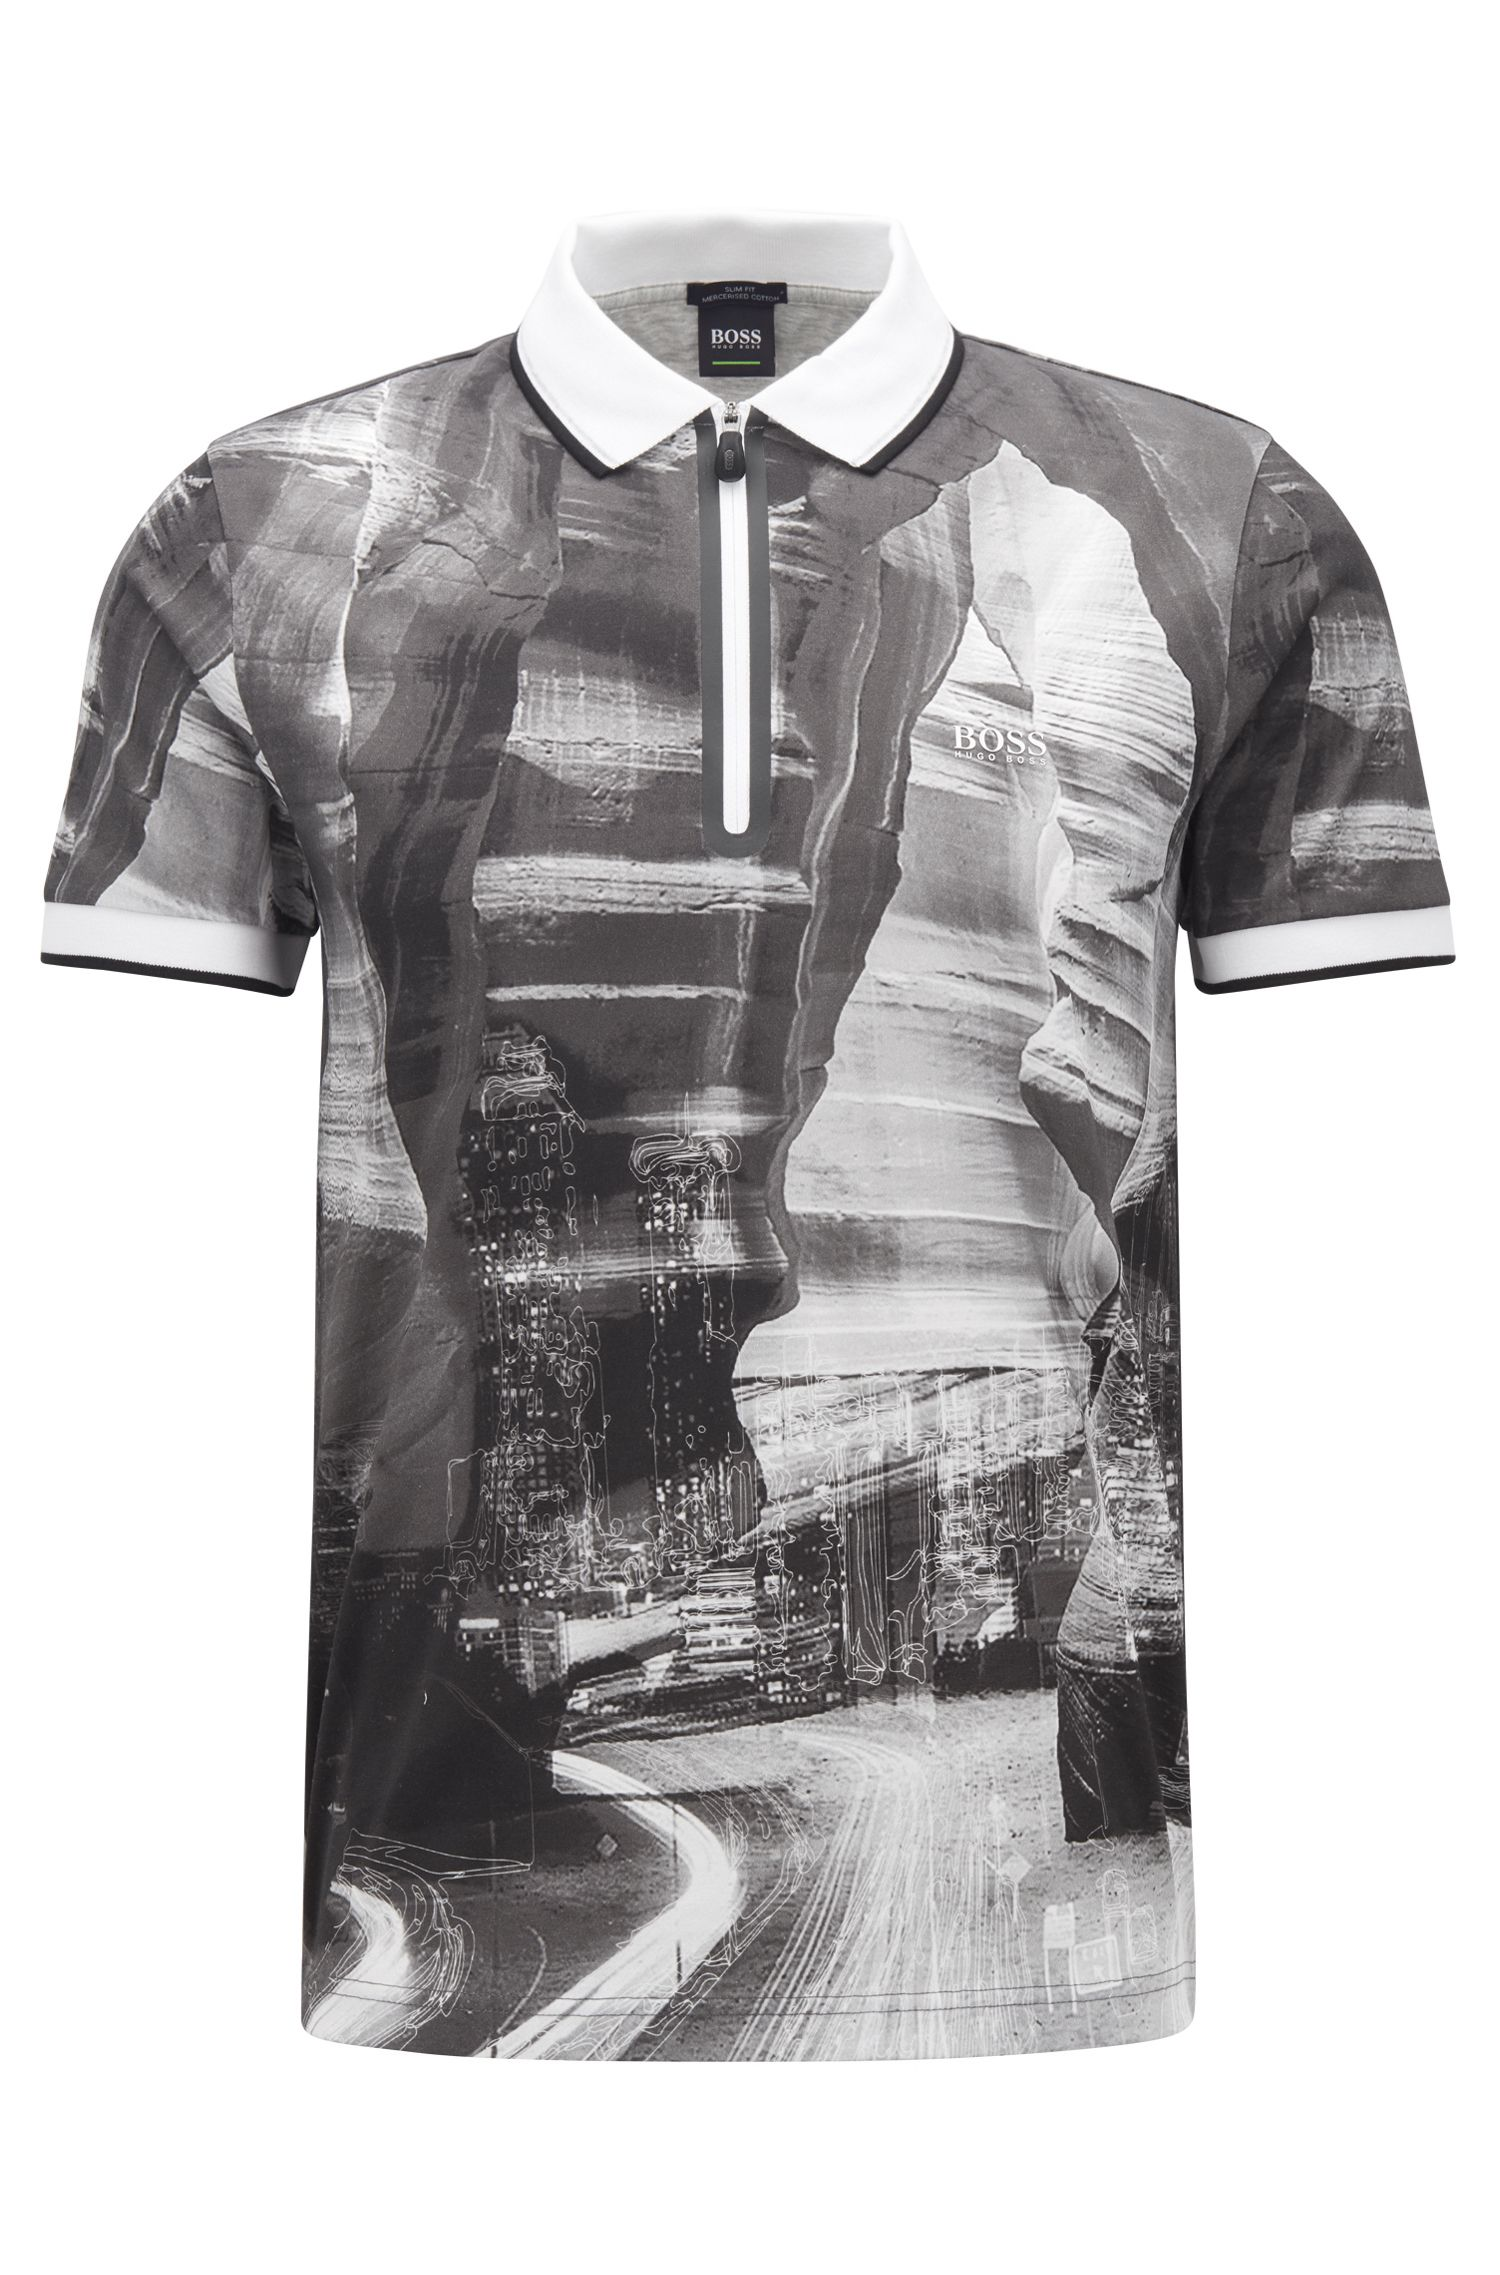 Slim-fit zipper-neck printed polo shirt cotton, Black